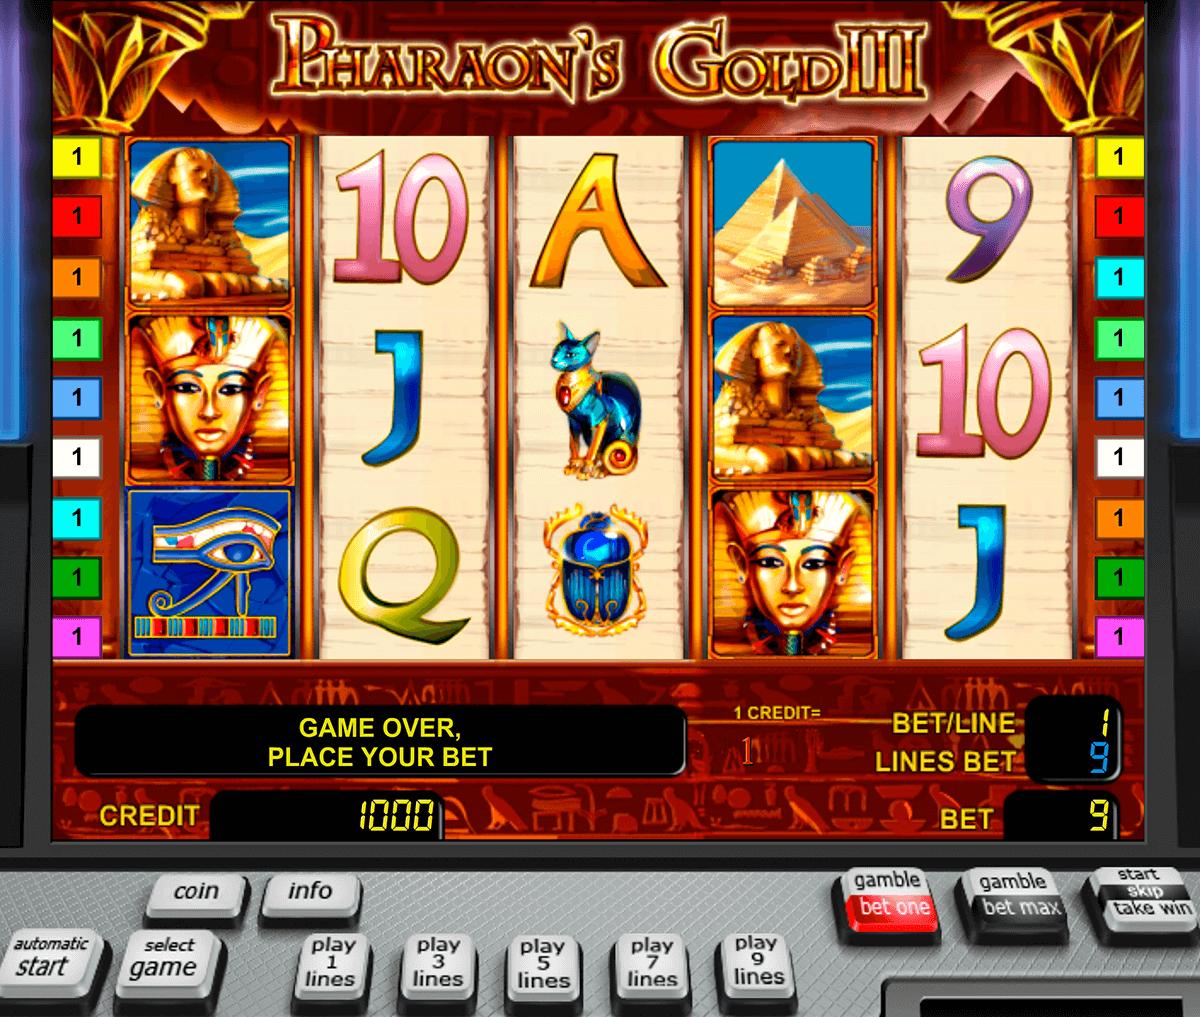 pharaohs gold iii novomatic automat online